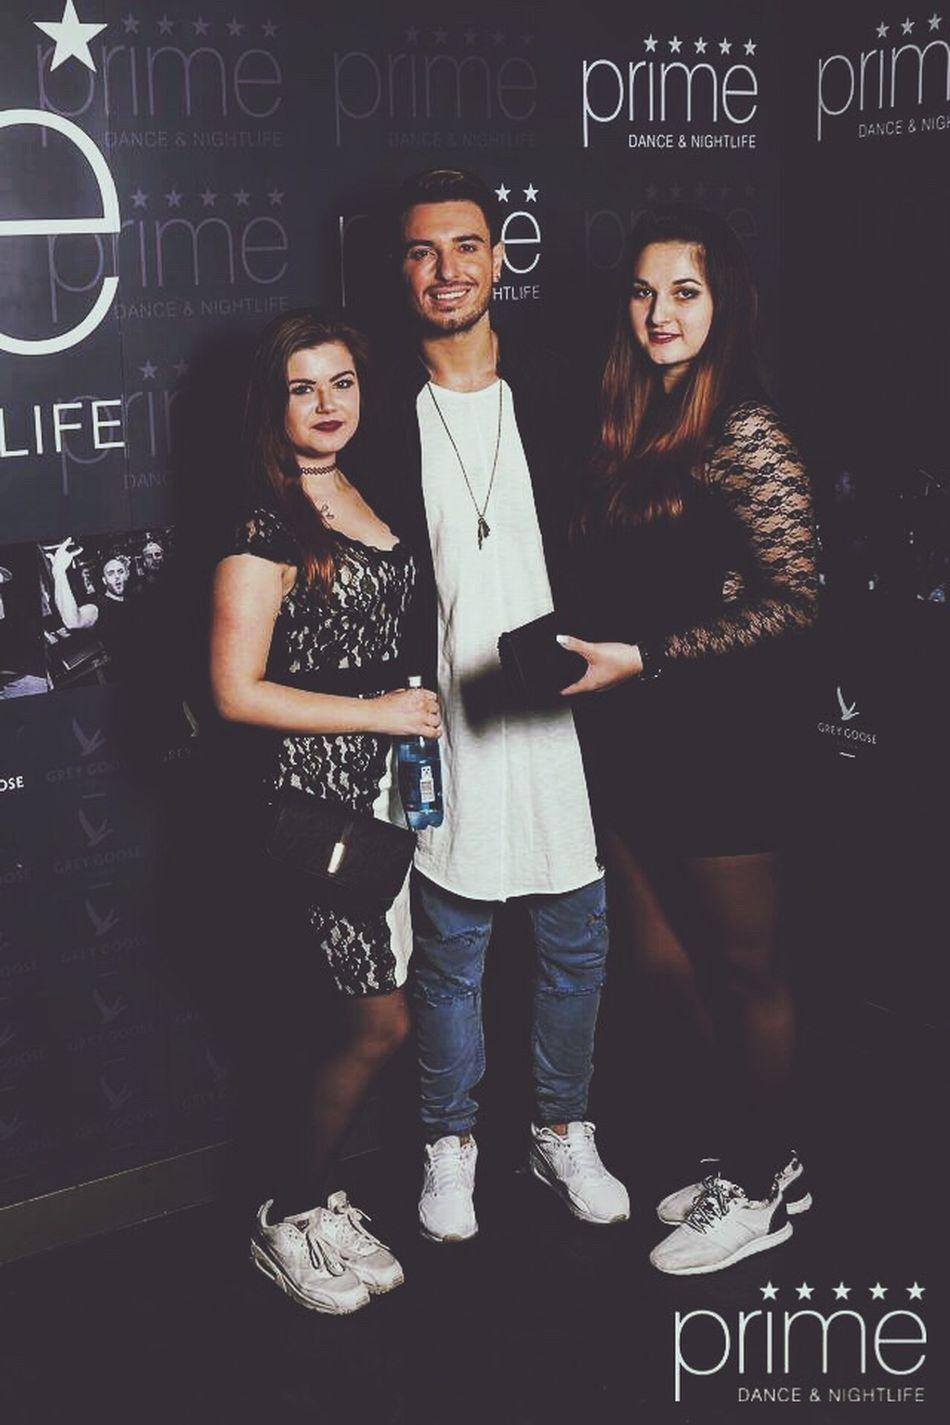 FAYDEE❤️25.12.2016🎉 Faydee Prime Club Bielefeld Clubnight Clubbing Best Friends Love Nightlife He Is Perfect He Is So Cute